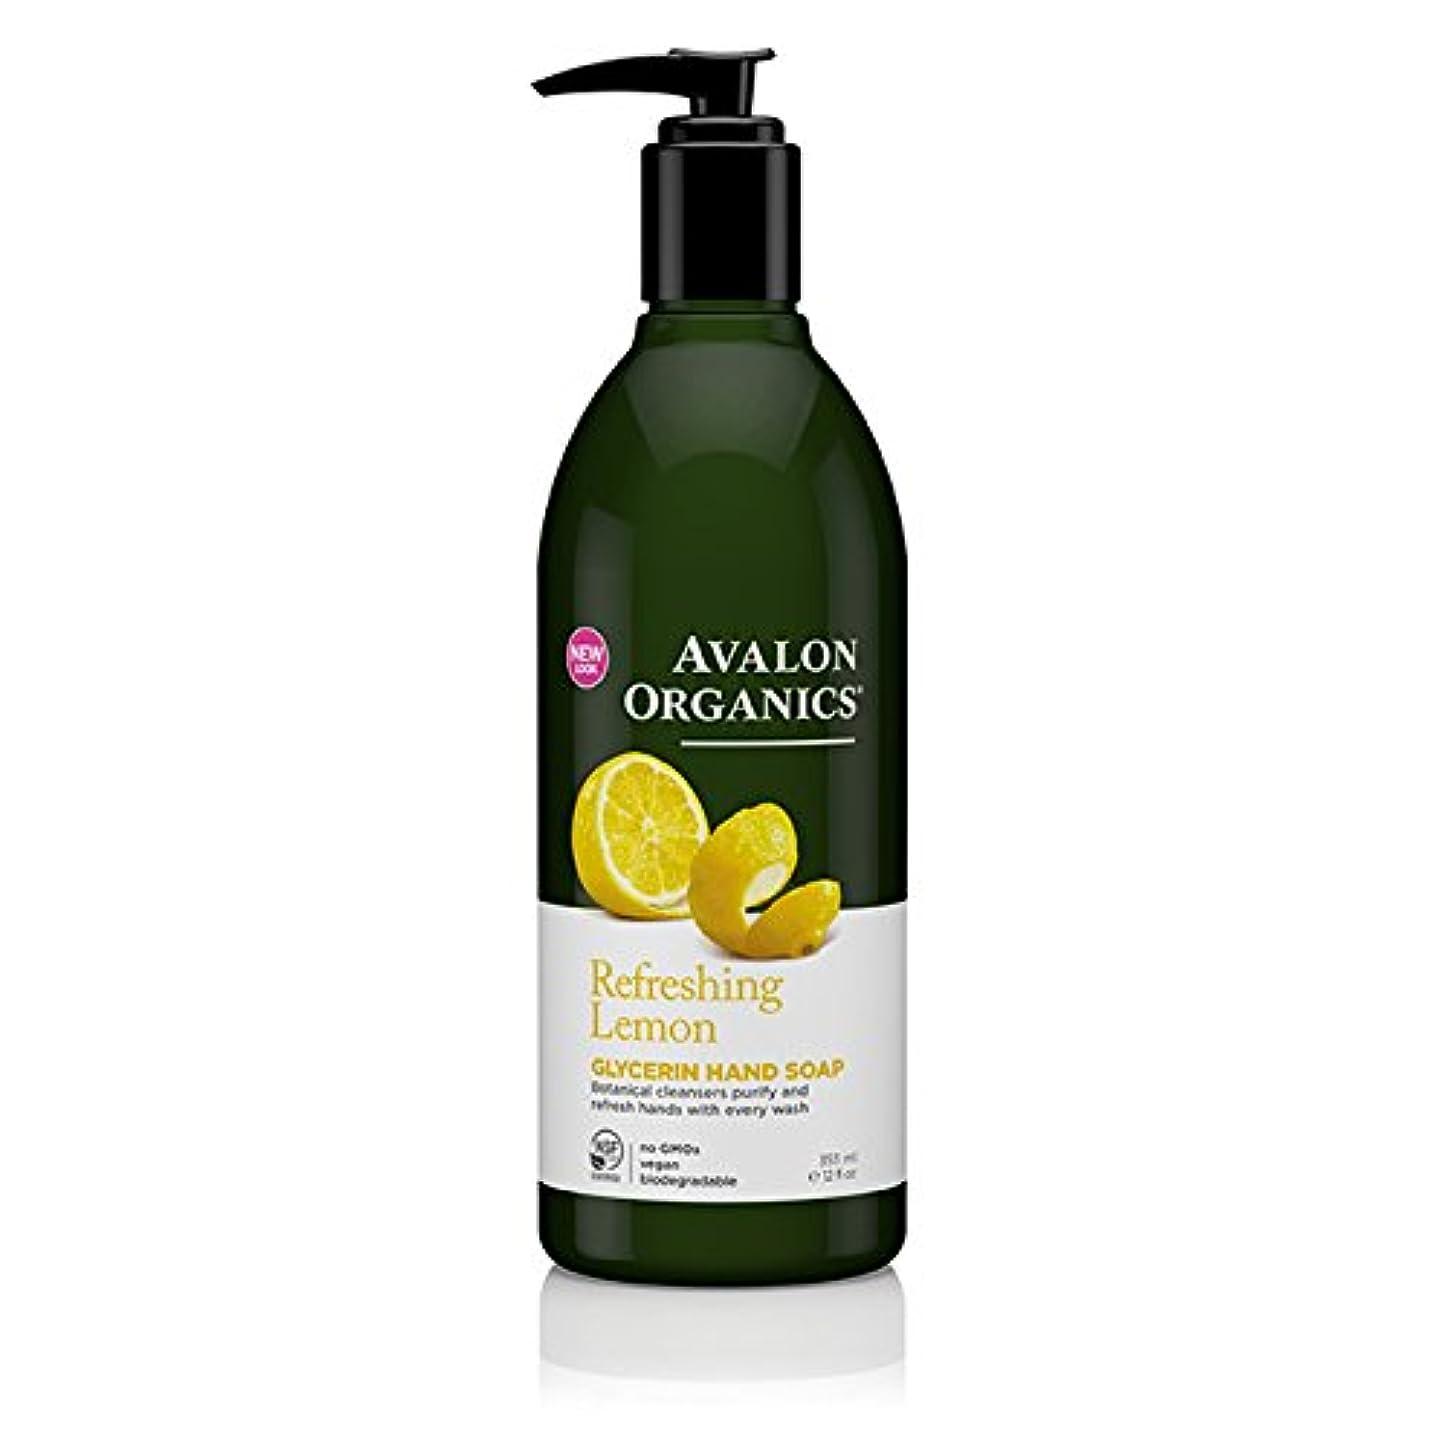 AVALON ORGANICS アバロンオーガニクス ハンドソープ レモン 355ml